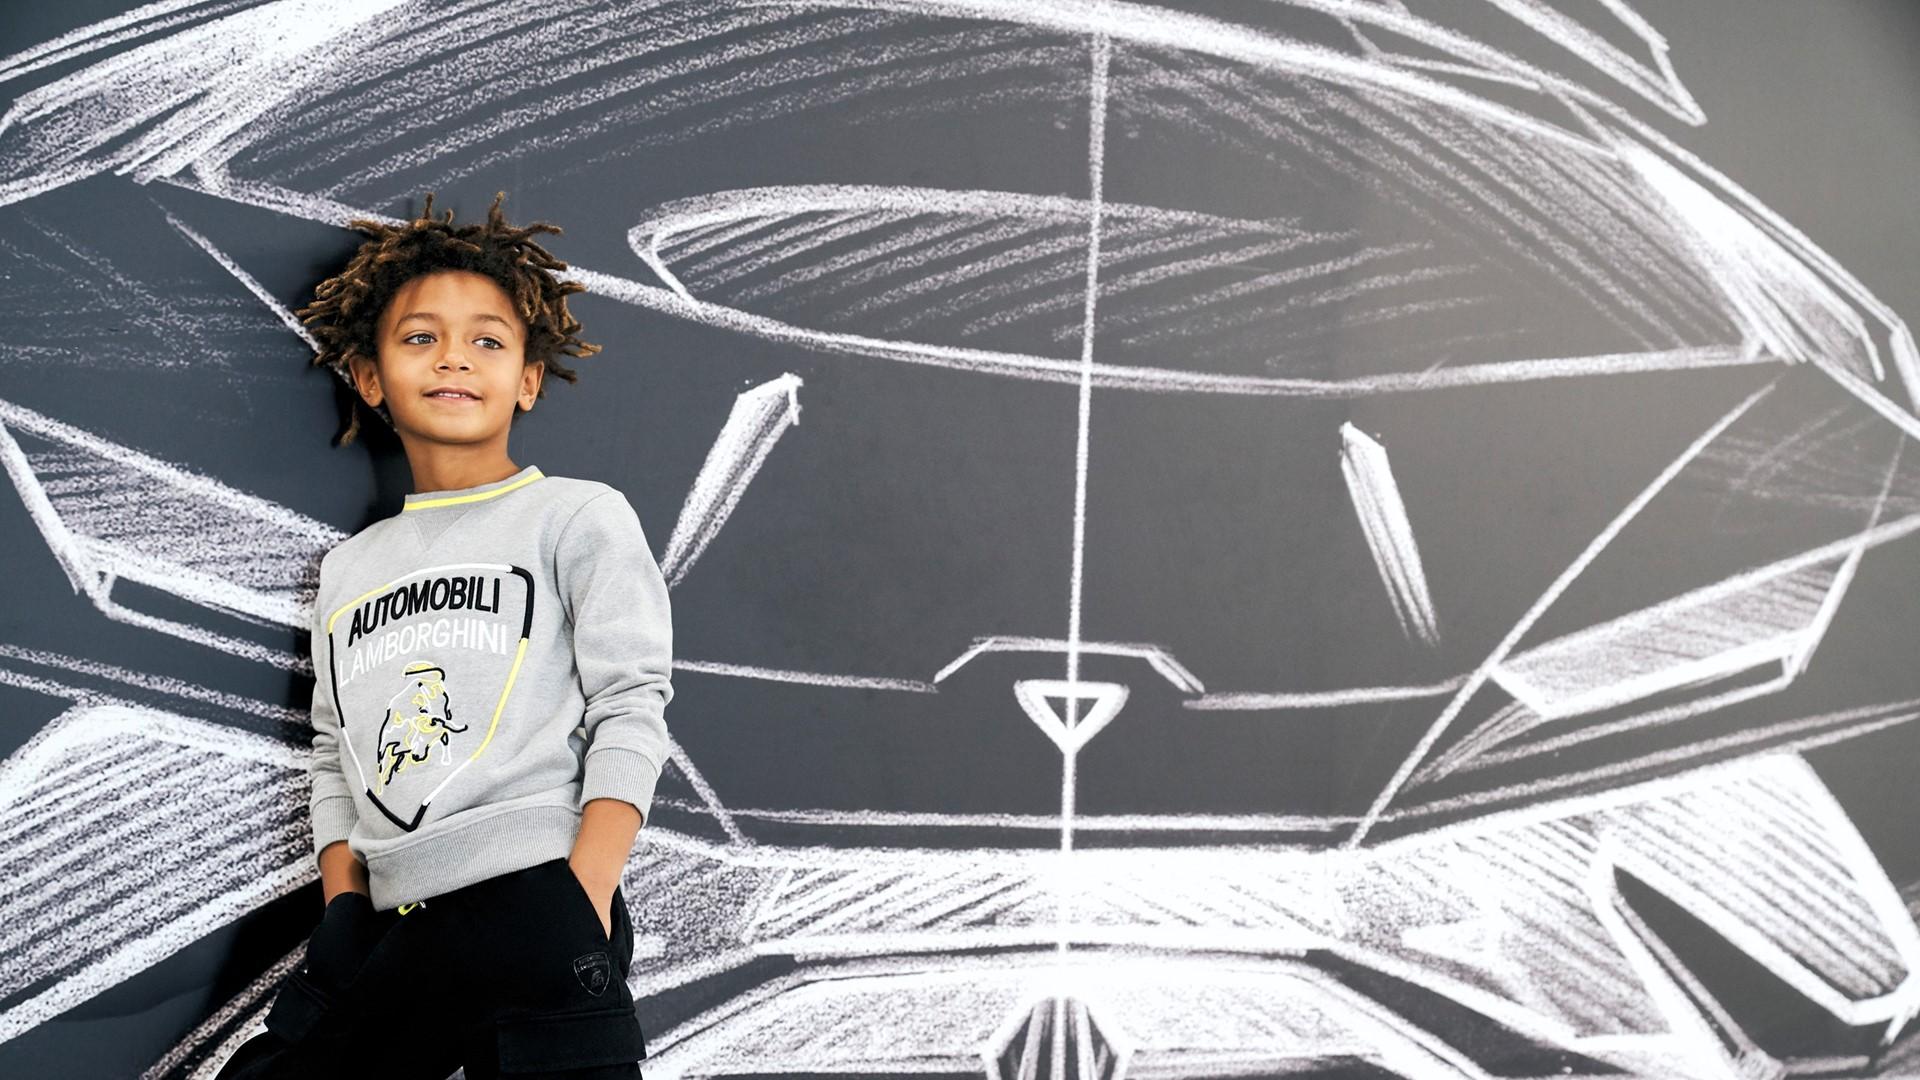 Automobili Lamborghini and KABOOKI confirm kidswear licensing agreement - Image 5